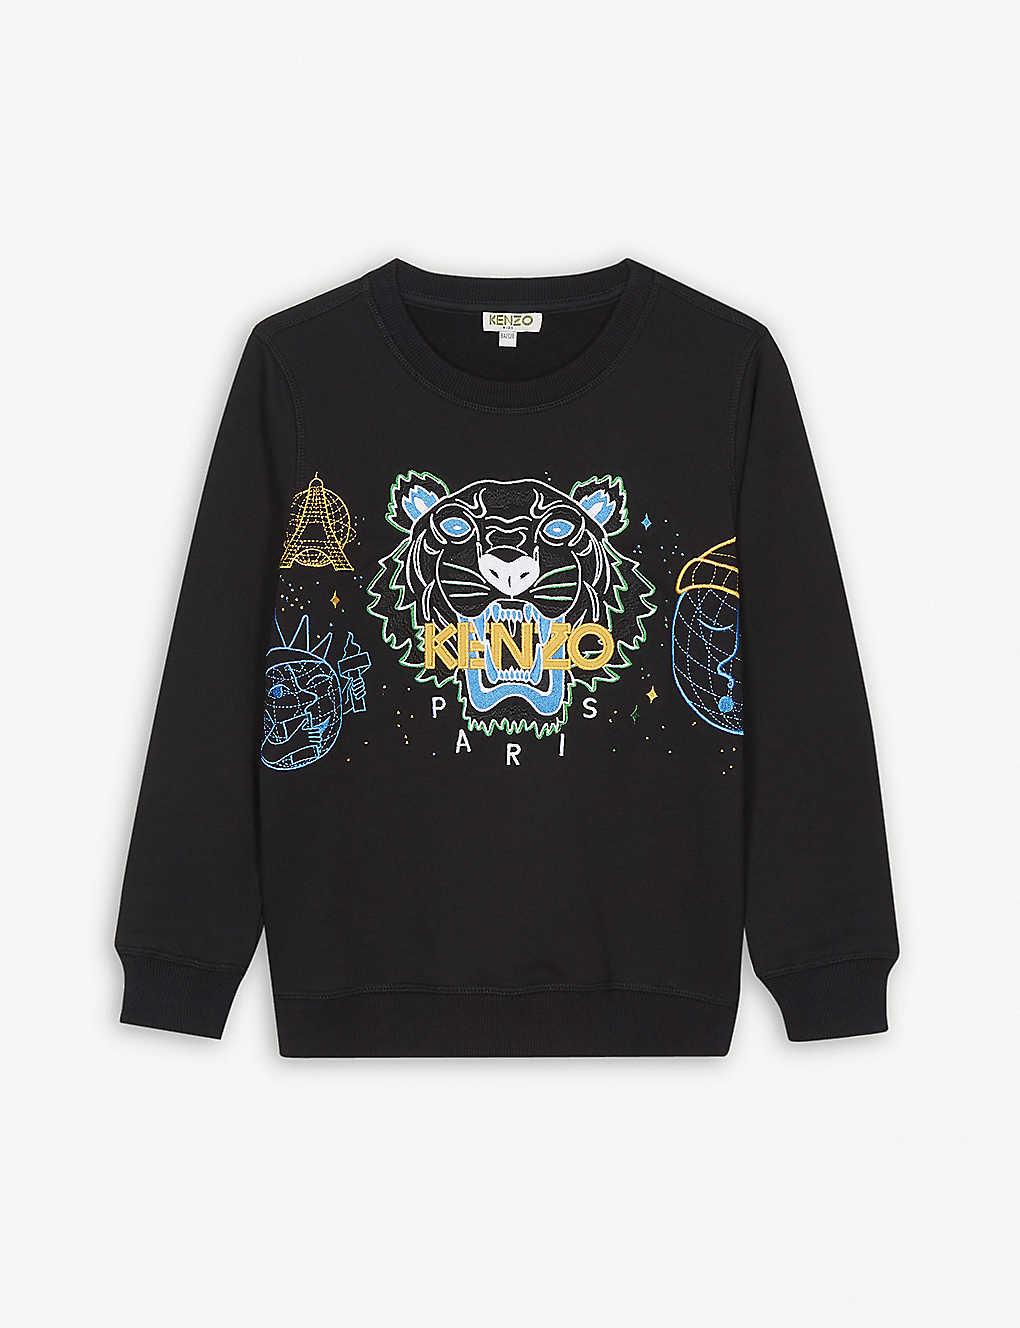 b1835d6205d9 KENZO - Cosmic tiger cotton-blend sweatshirt 4-16 years | Selfridges.com